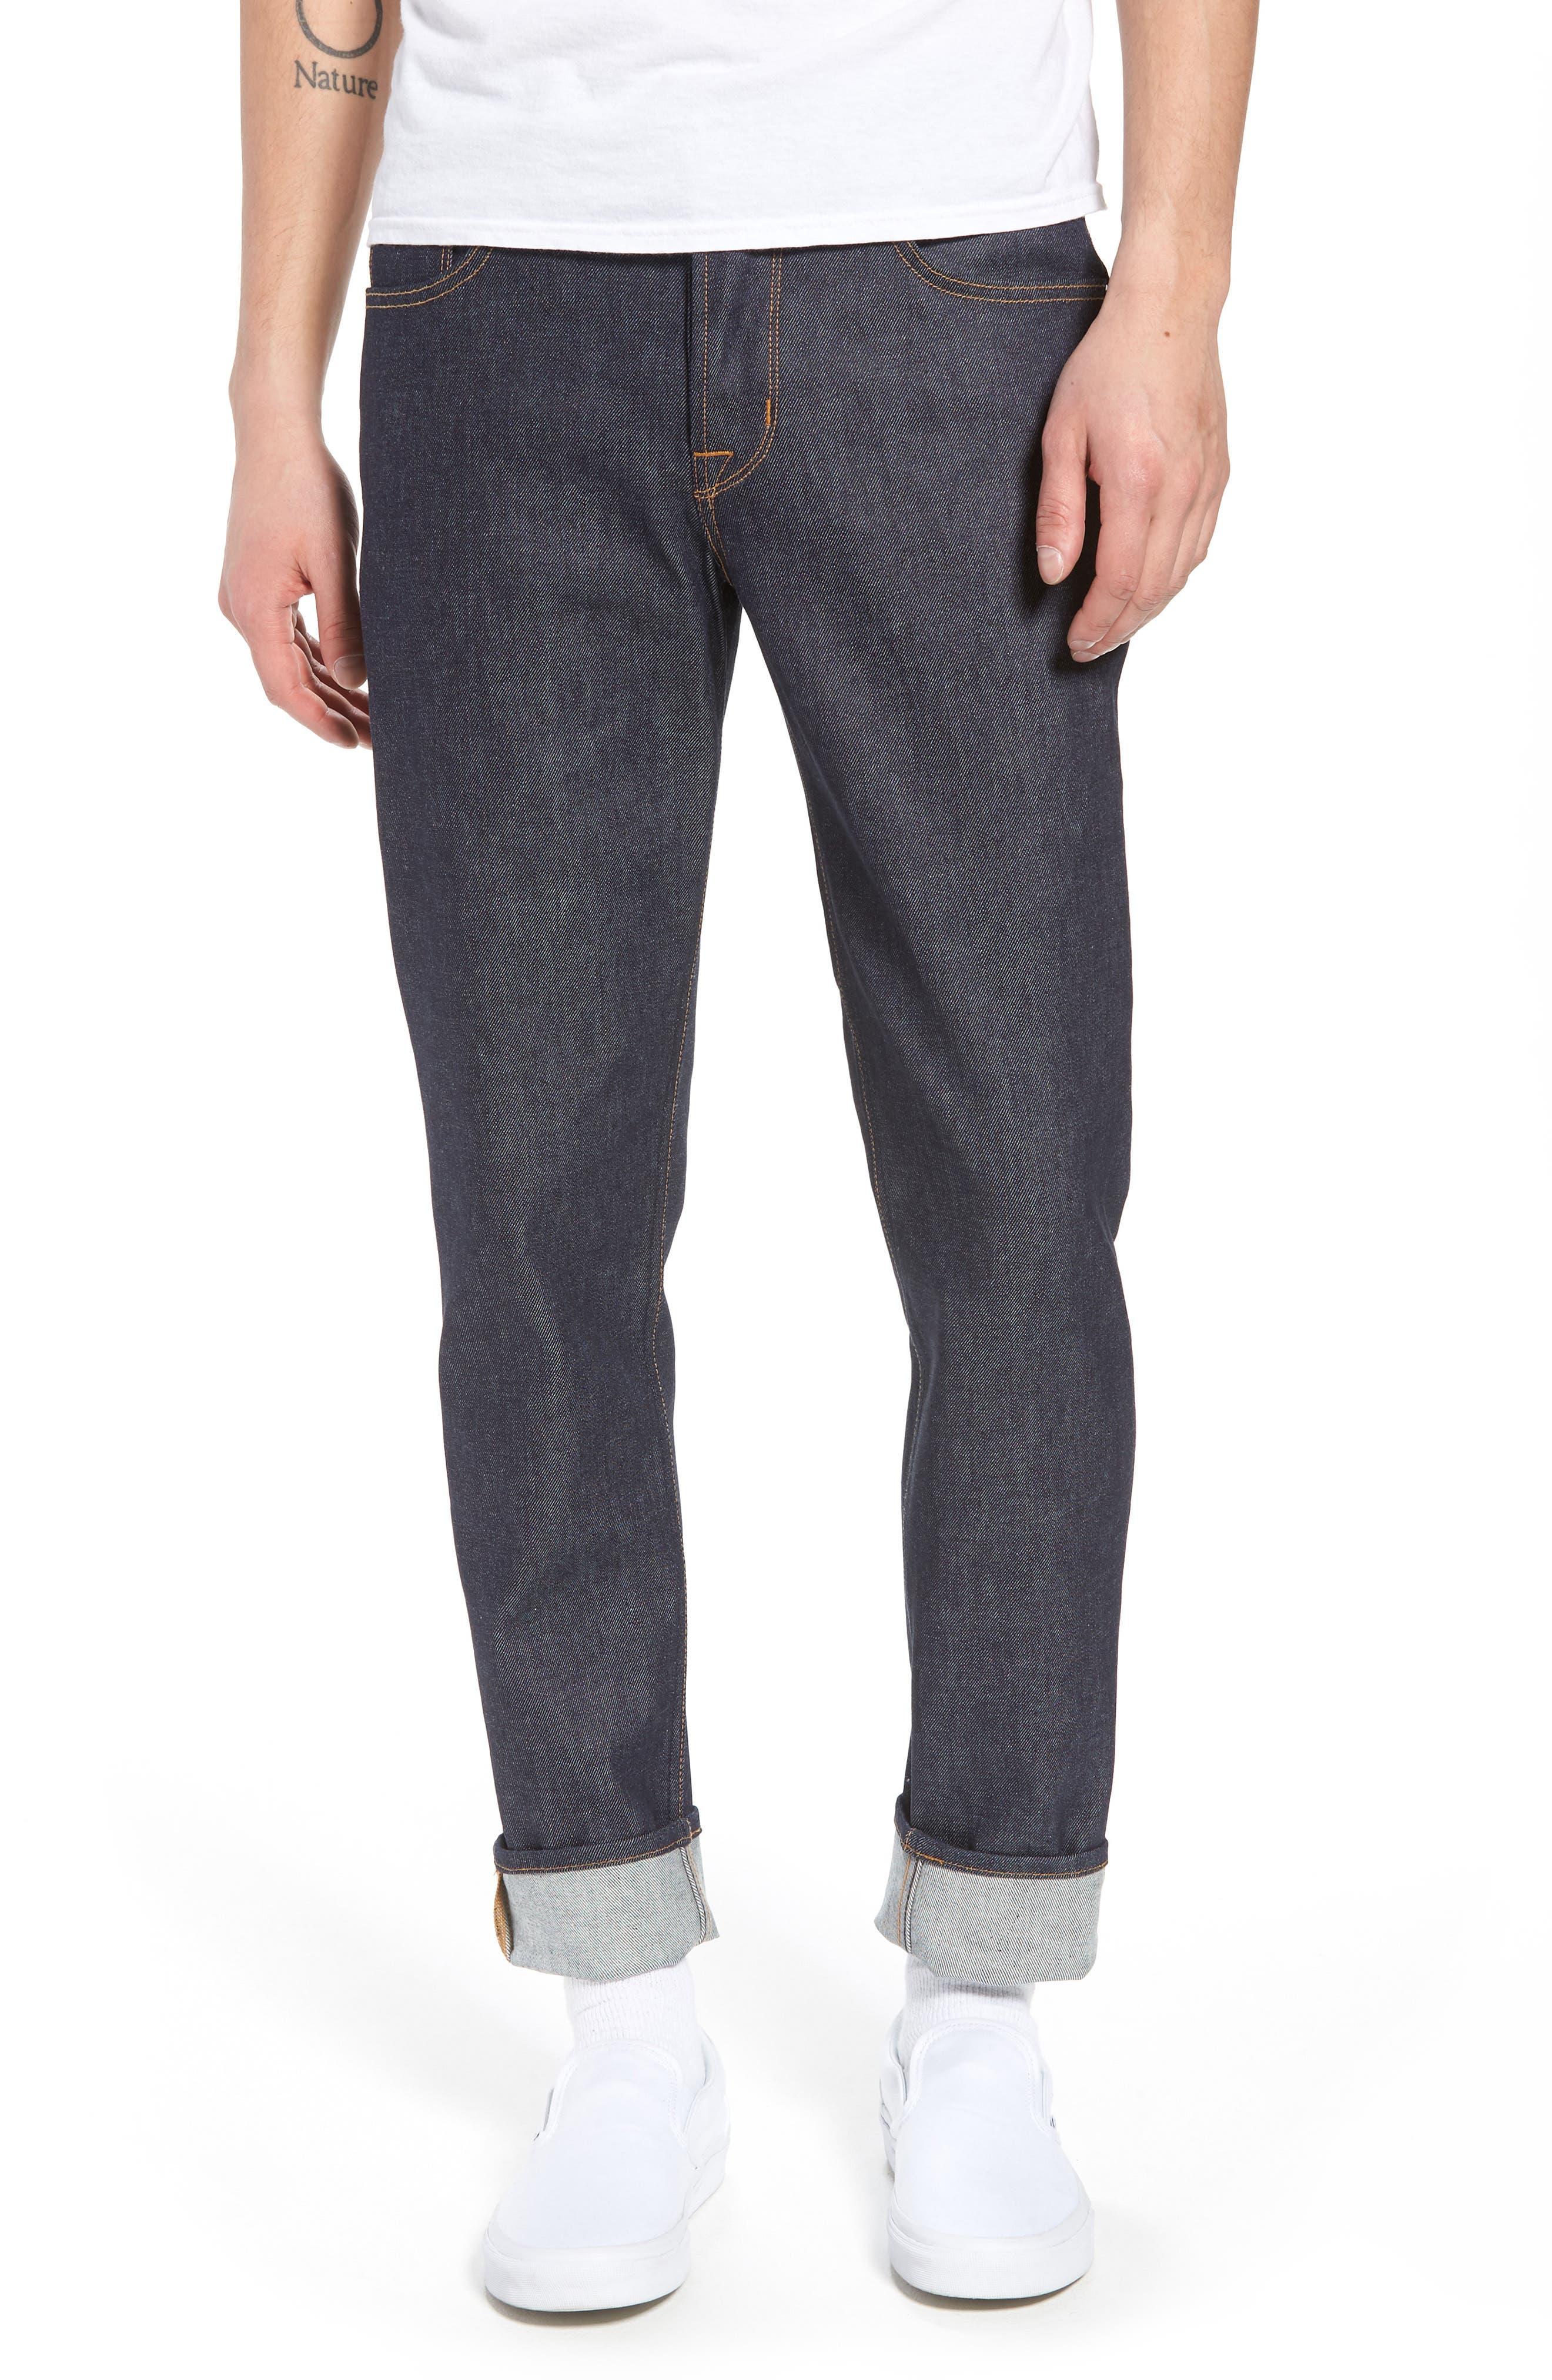 Sartor Skinny Fit Jeans,                             Main thumbnail 1, color,                             RAW